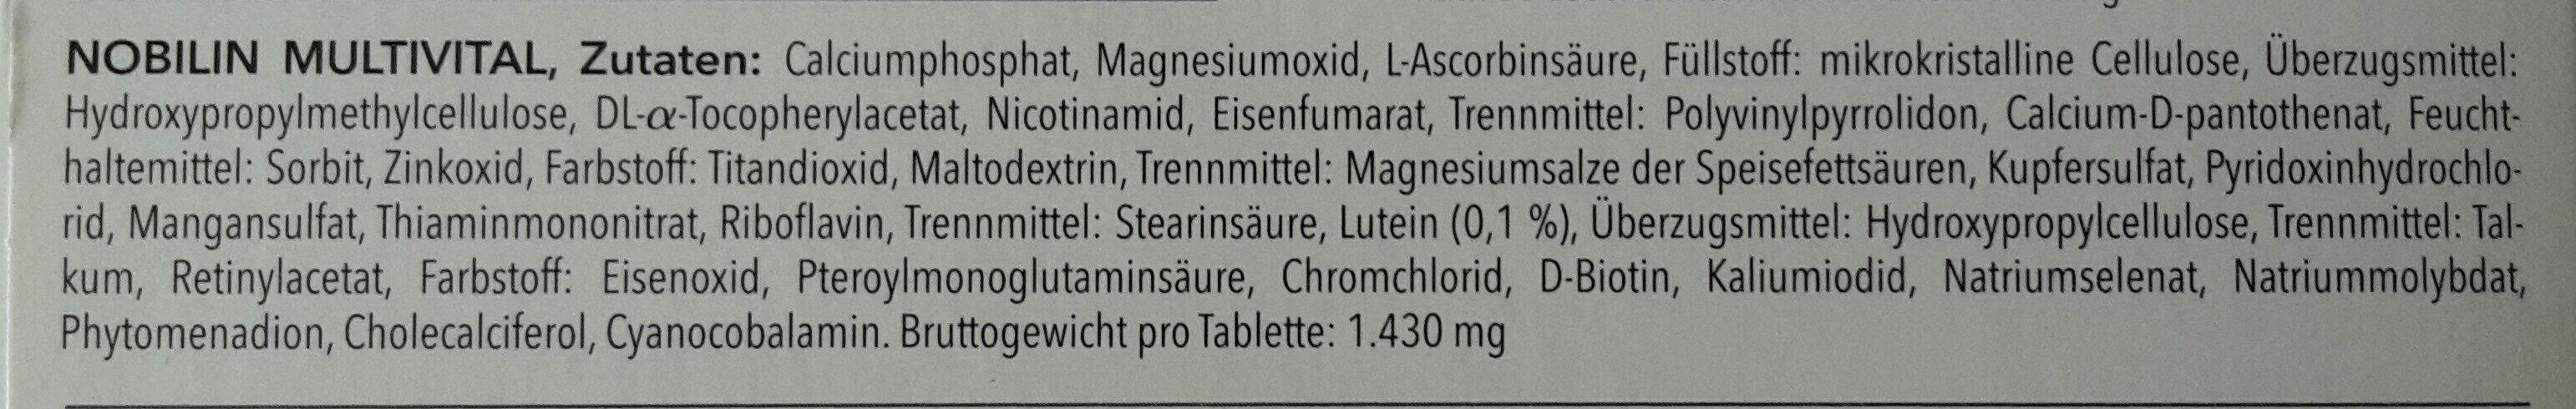 Nobilin Multivital - Ingredients - de